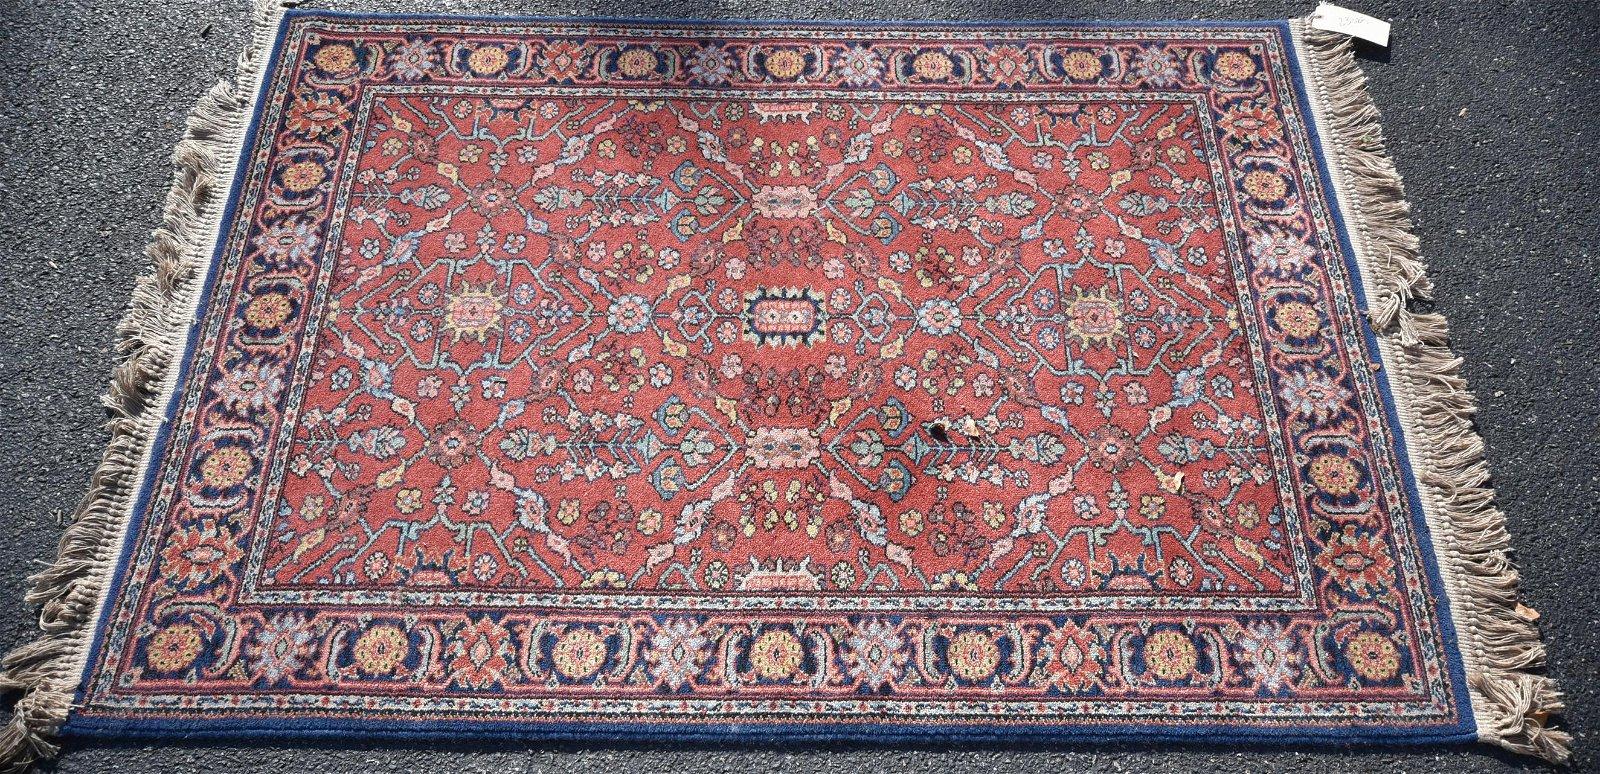 "4'3"" x 6' Karastan Serapi rug"